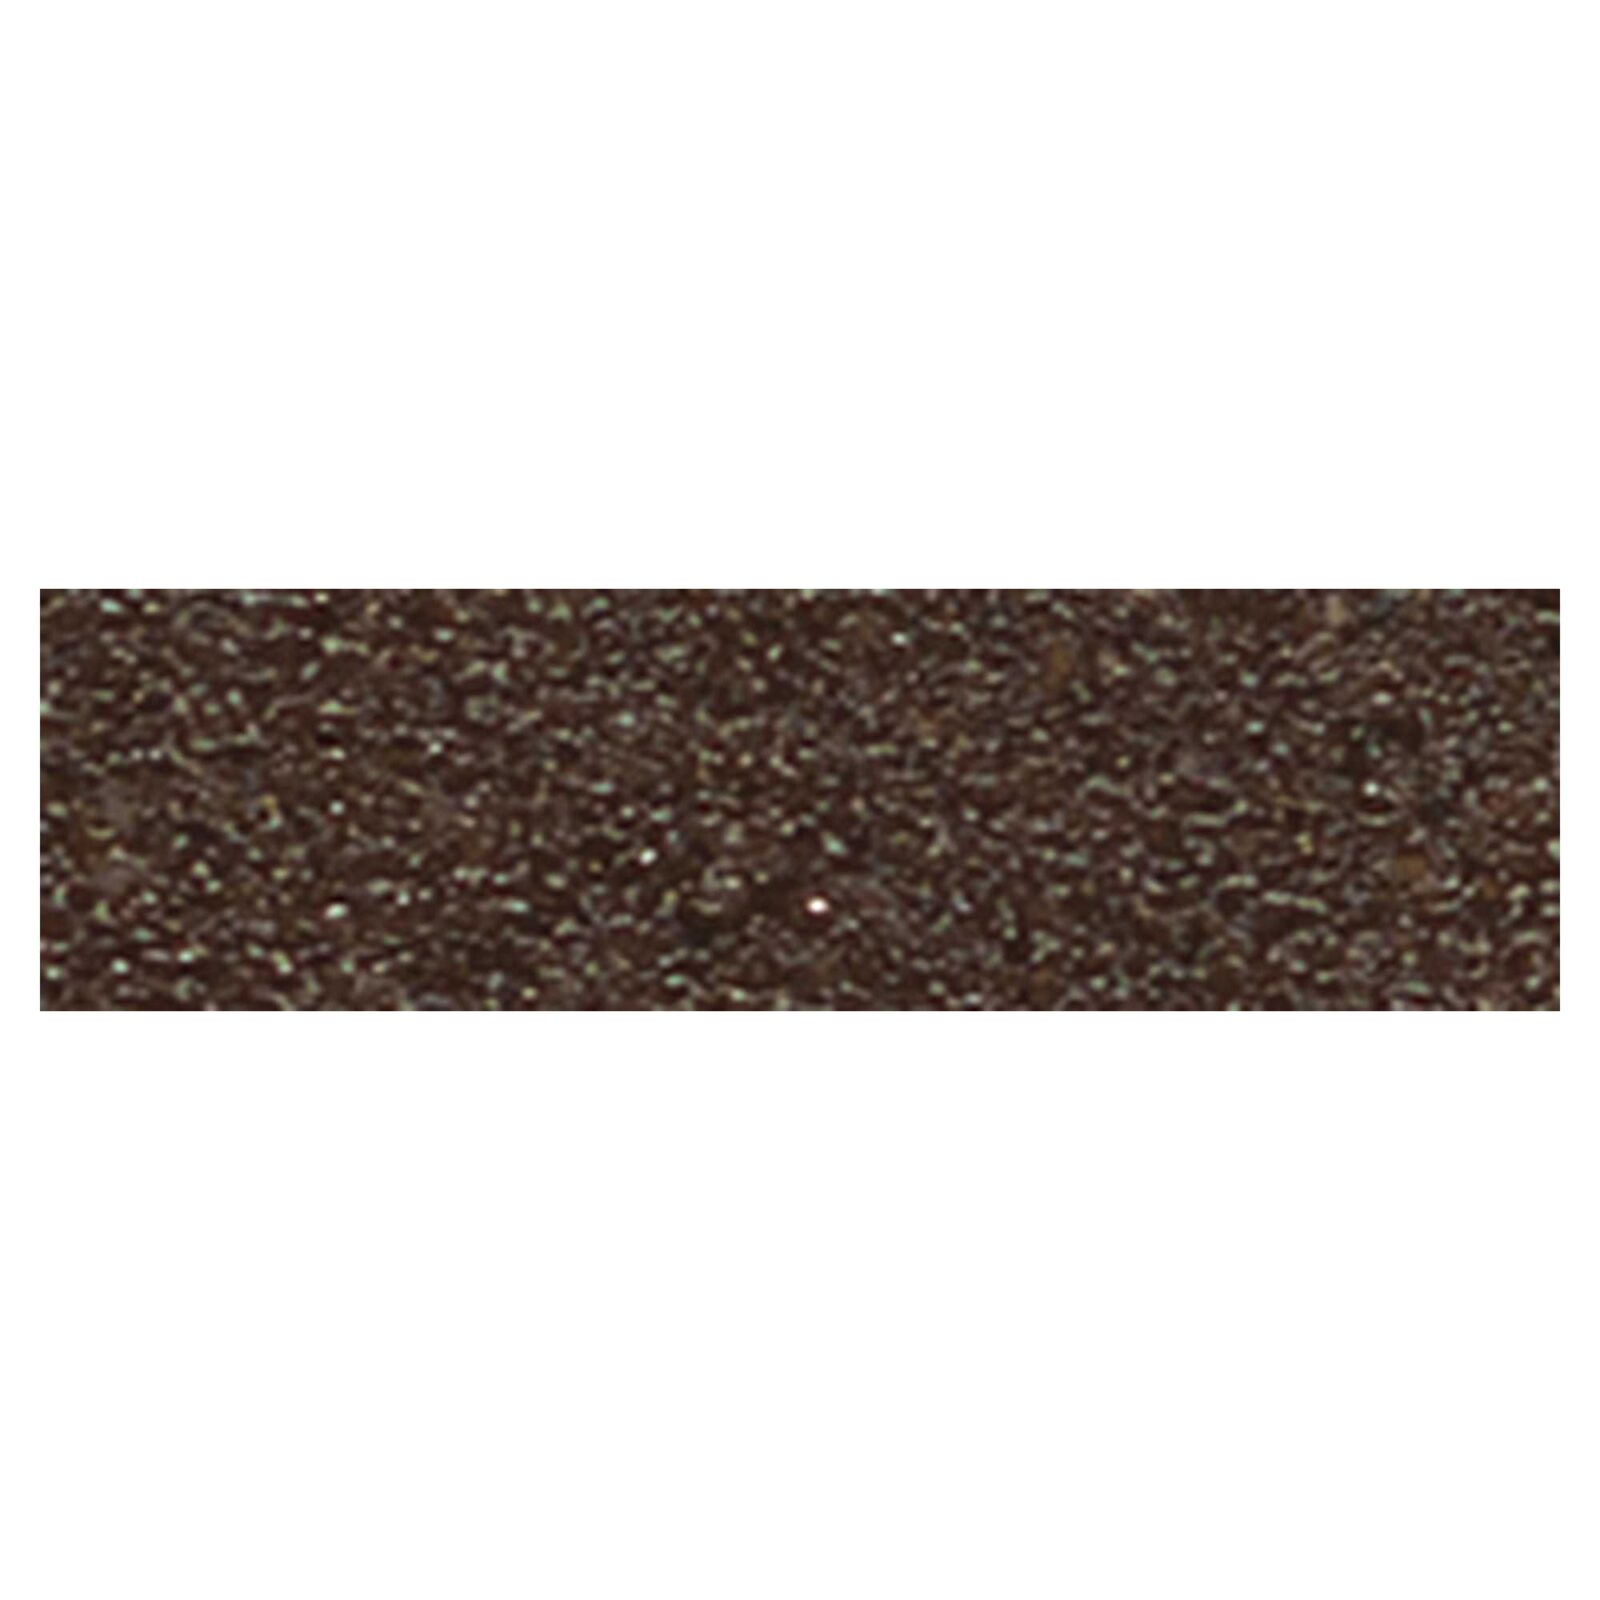 Мойка G-6(шоколад) (750х490х190) из гранитной крошки+сифон